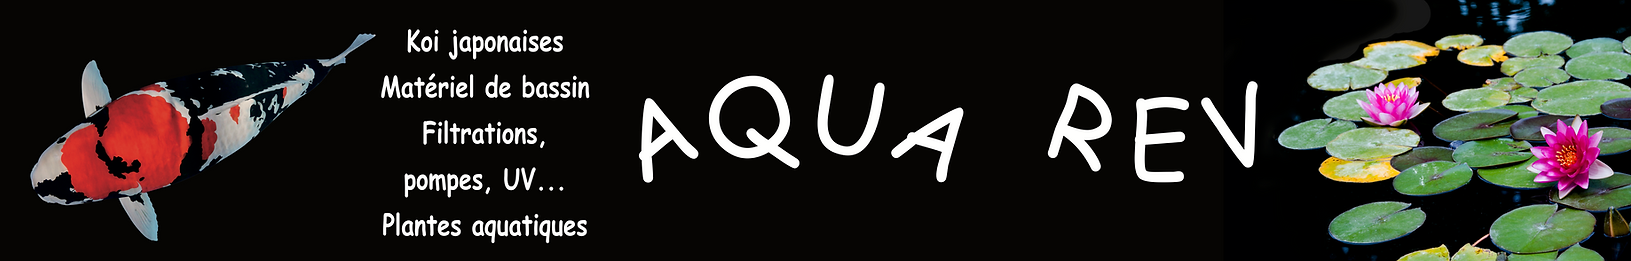 Panneau-Aqua-Rev-500x80-demi-2019-HD.png